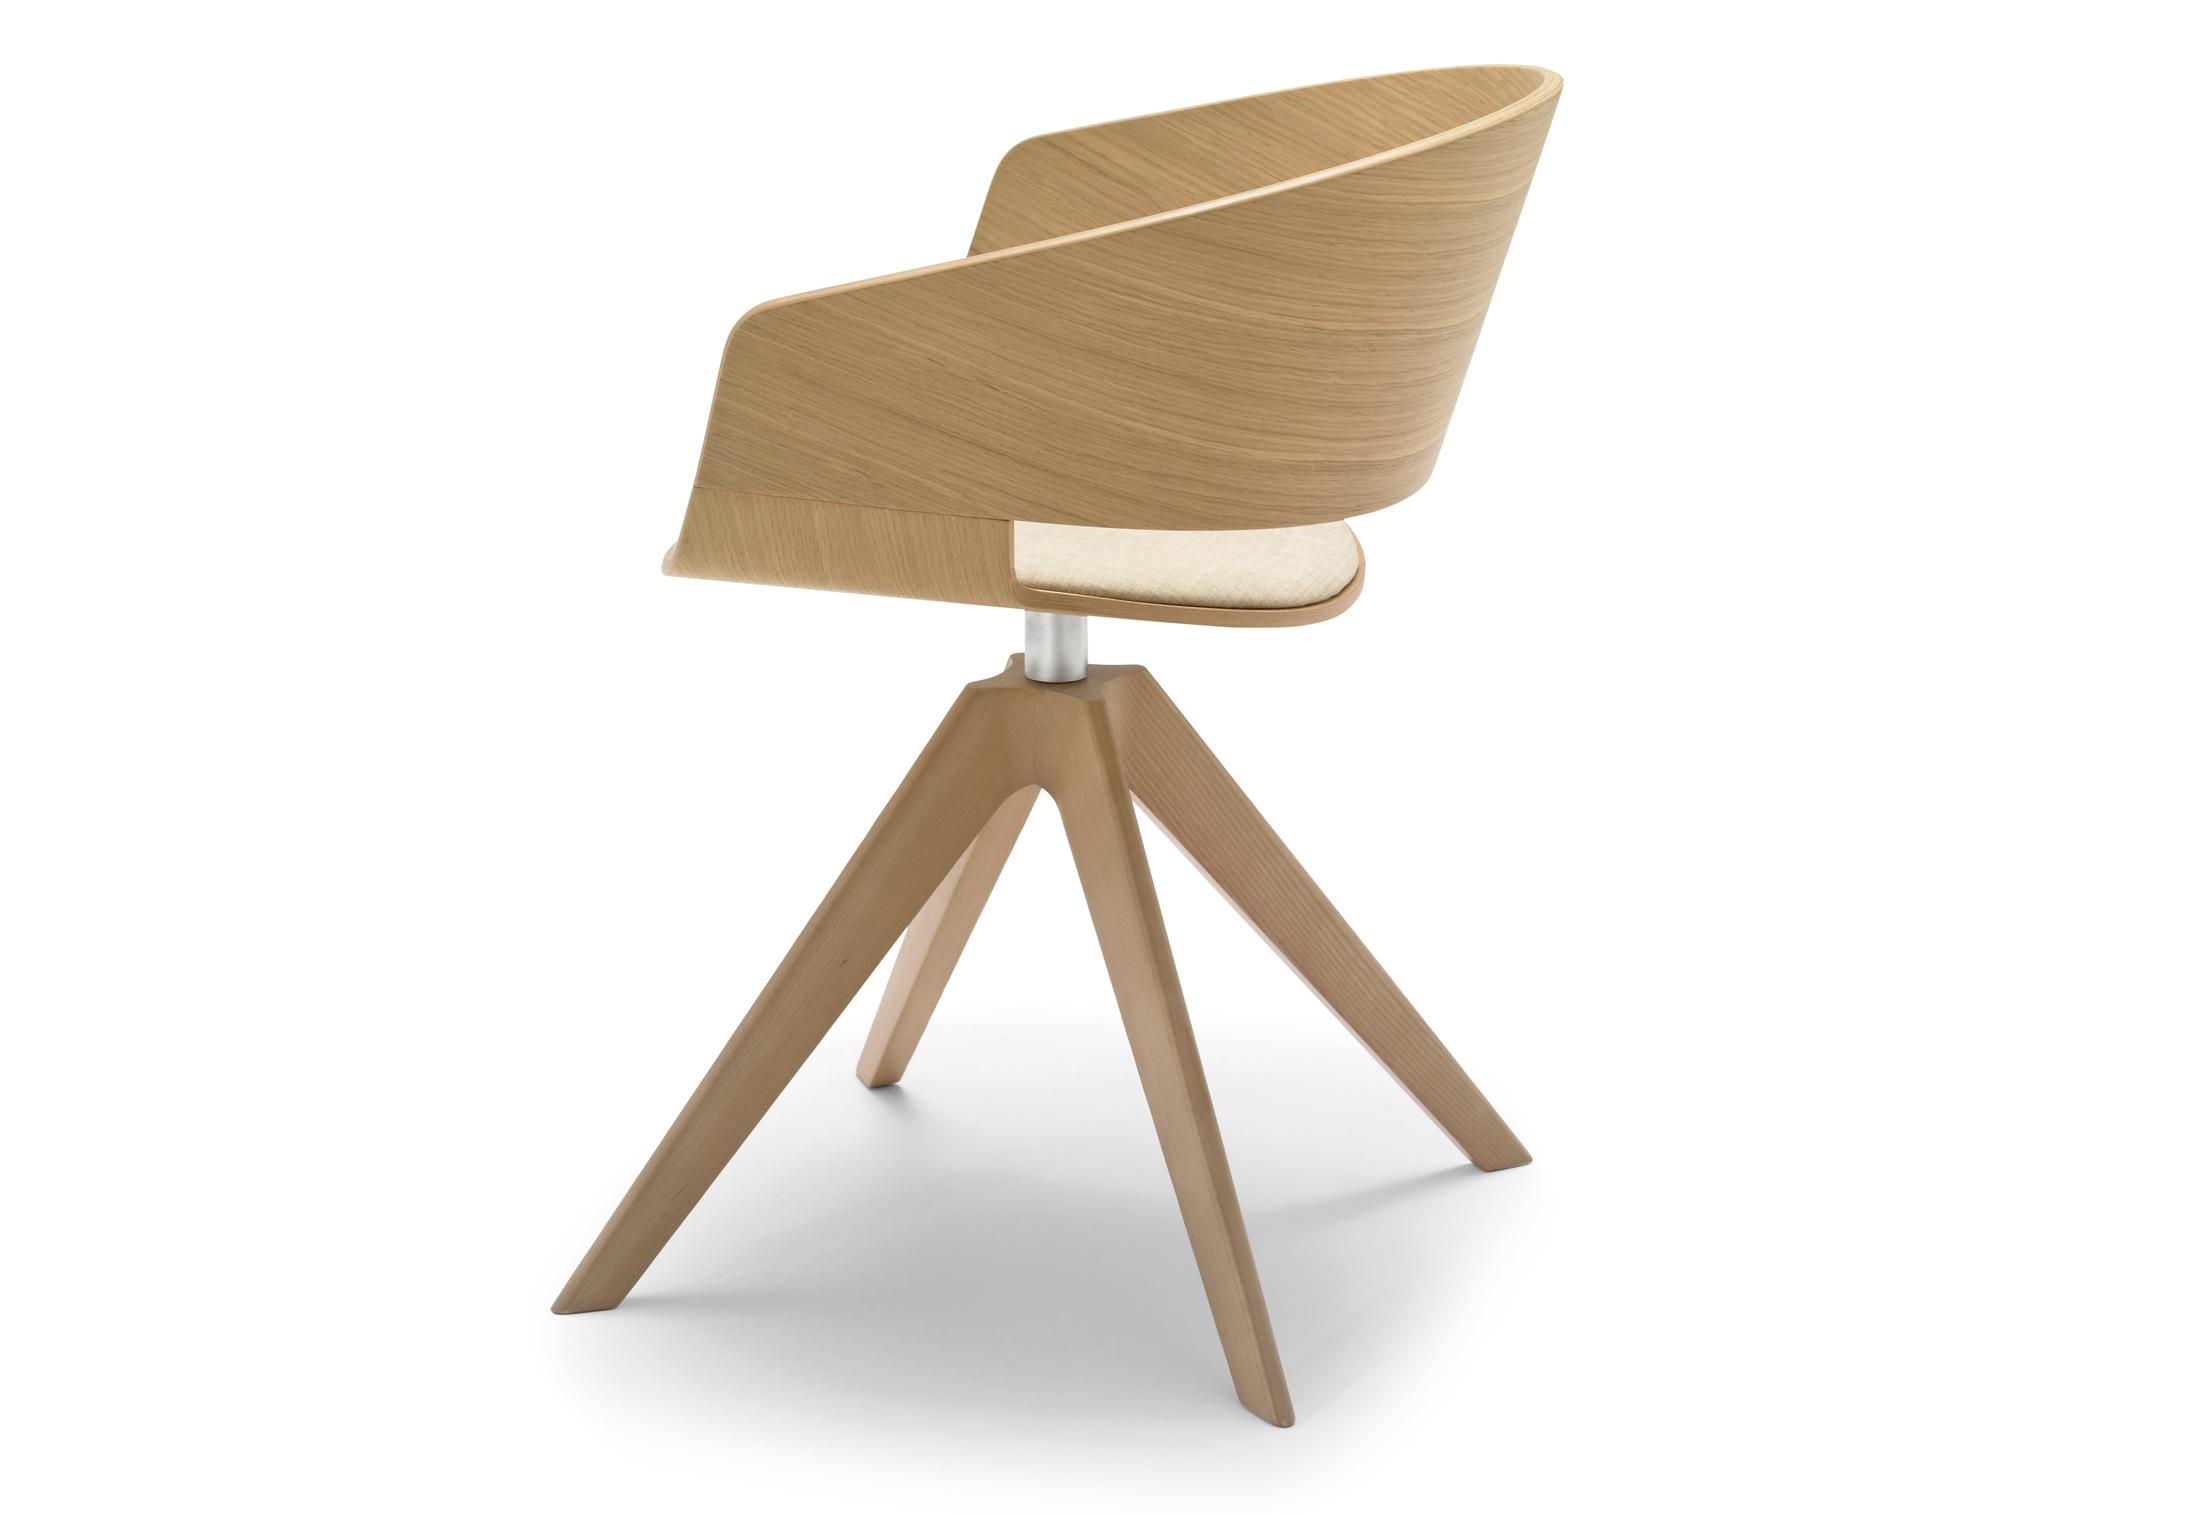 Schreibtischstuhl holz  Ronda Drehstuhl Holz von Andreu World | STYLEPARK